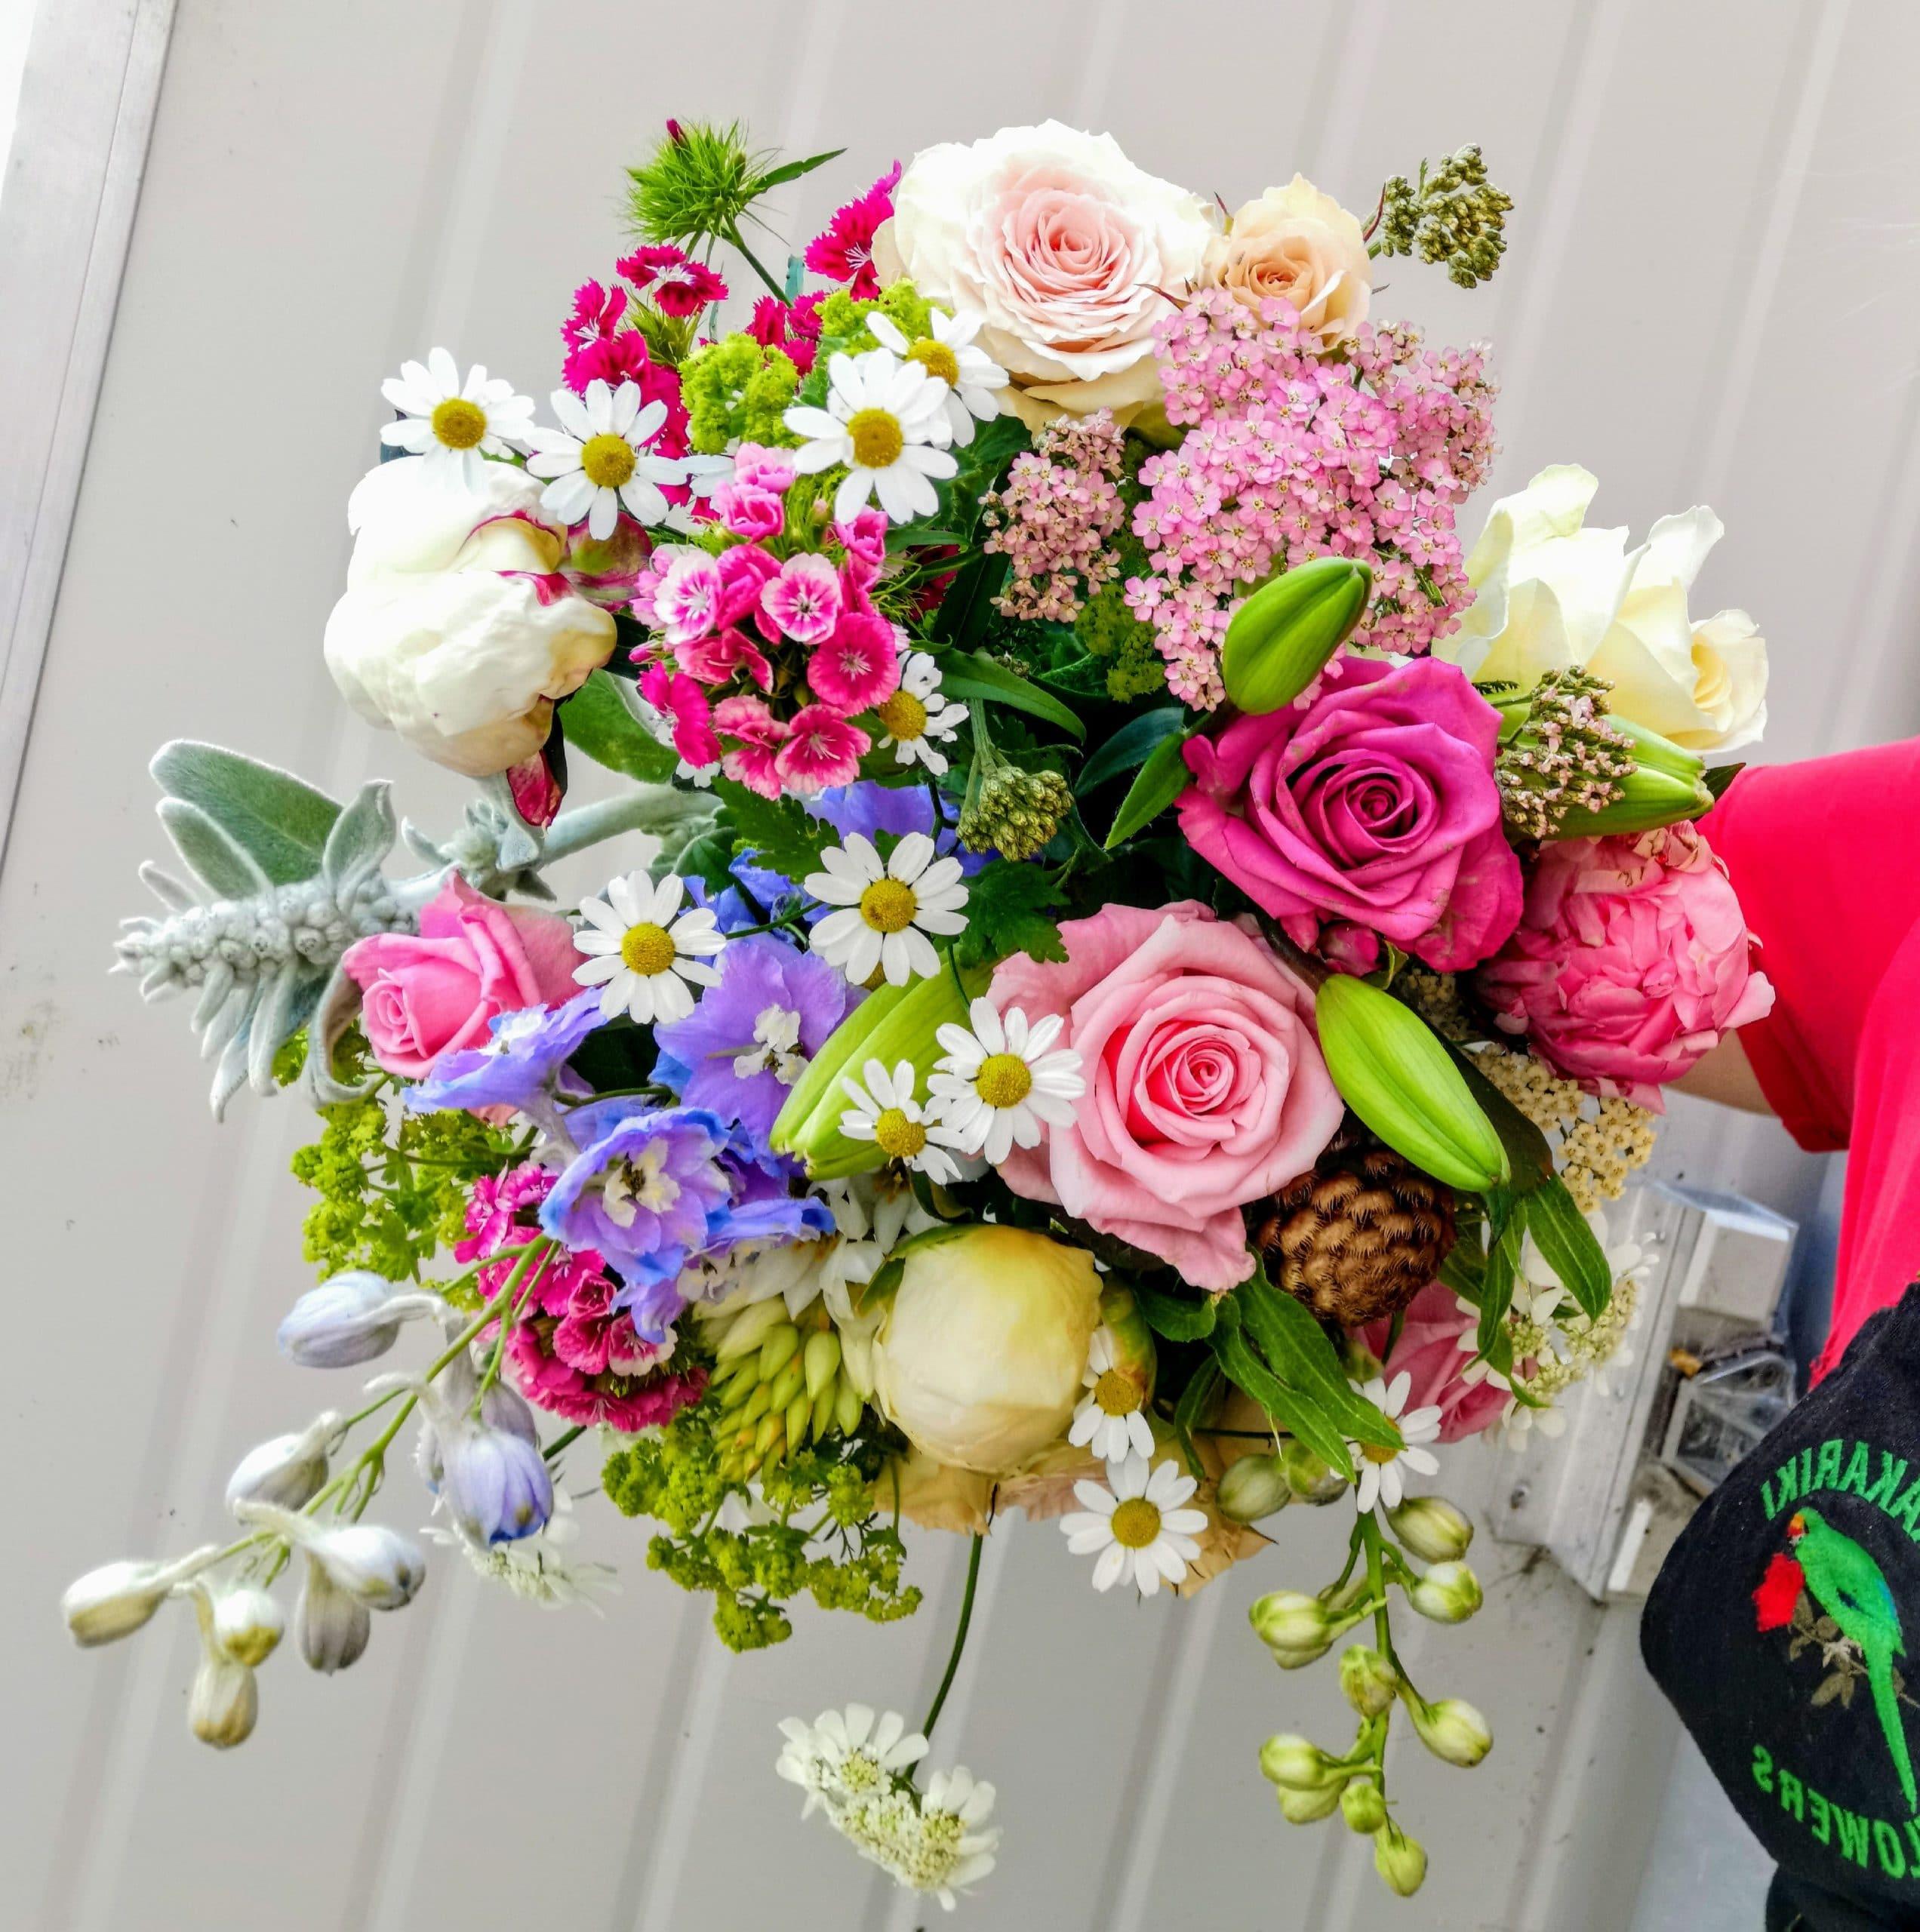 Kakariki Flowers - Wildflower blend